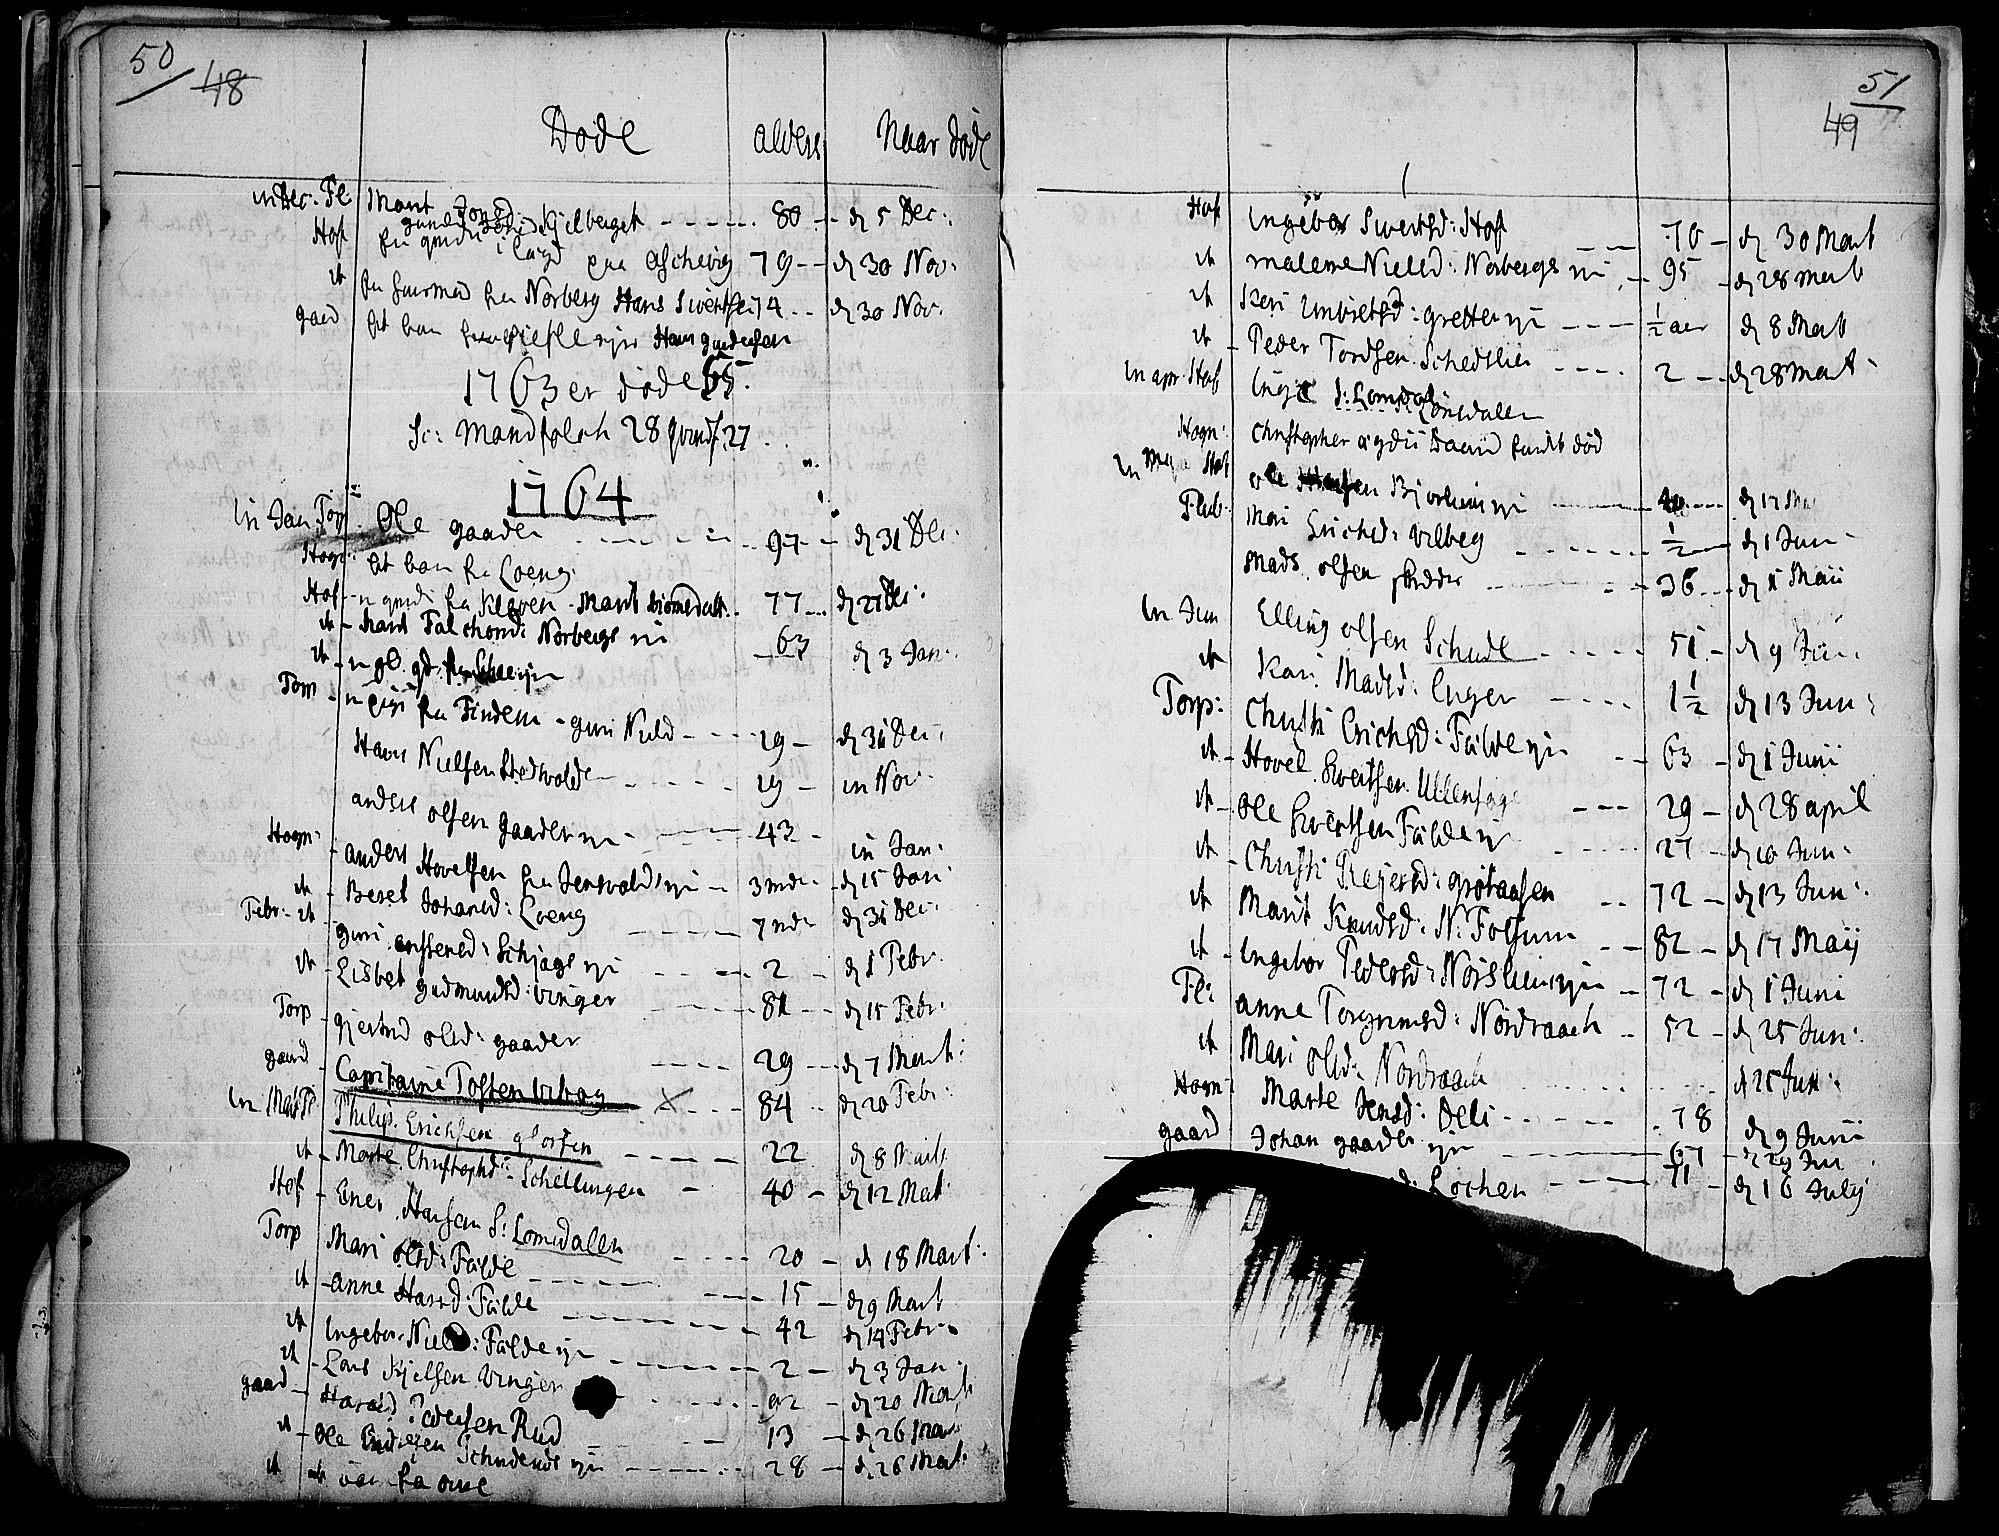 SAH, Land prestekontor, Parish register (official) no. 4, 1733-1764, p. 50-51